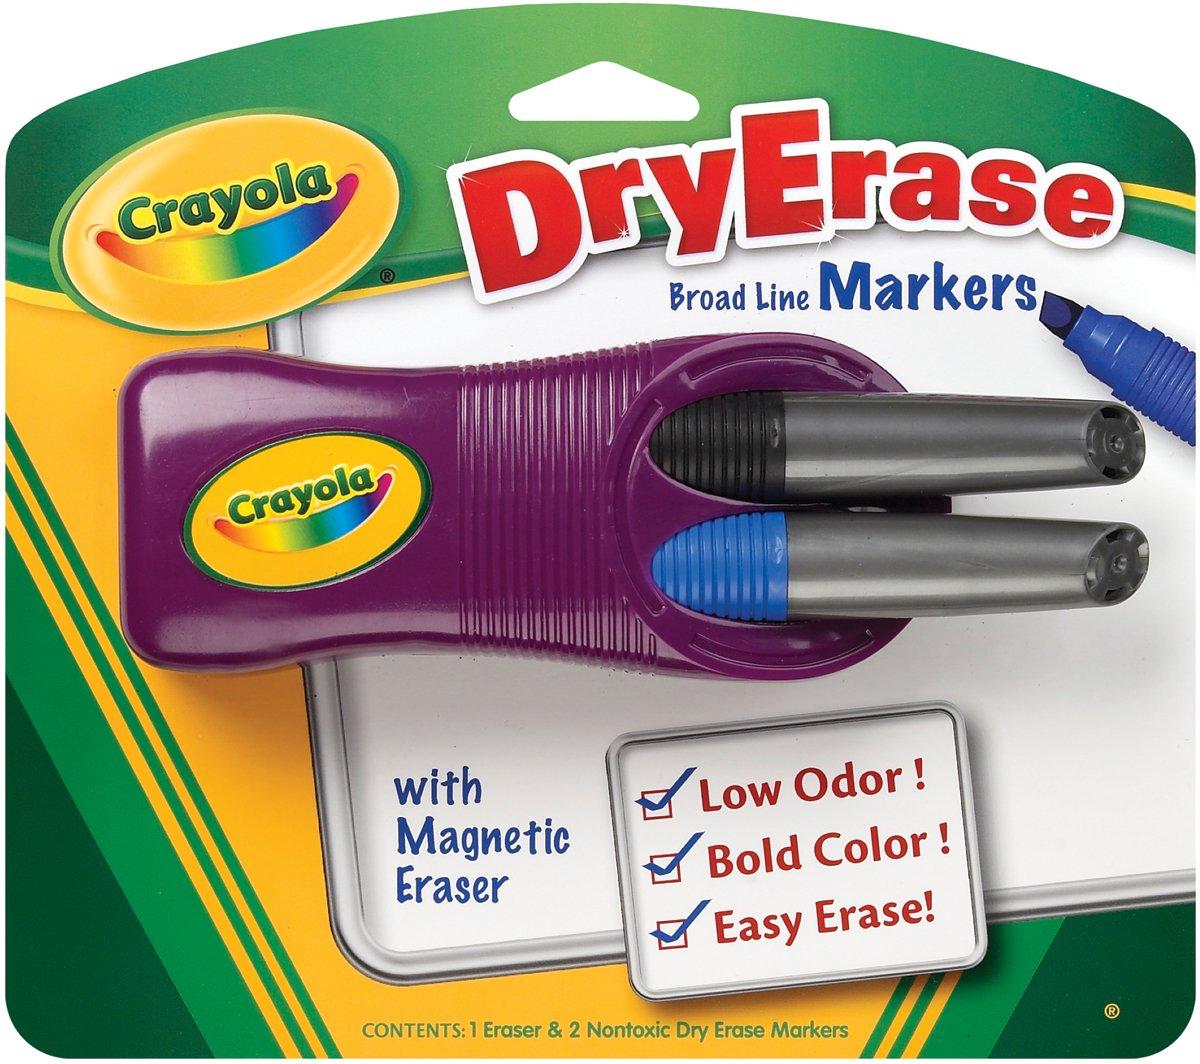 Crayola Dry Erase Markers Black Crayola Dry-erase Magnetic